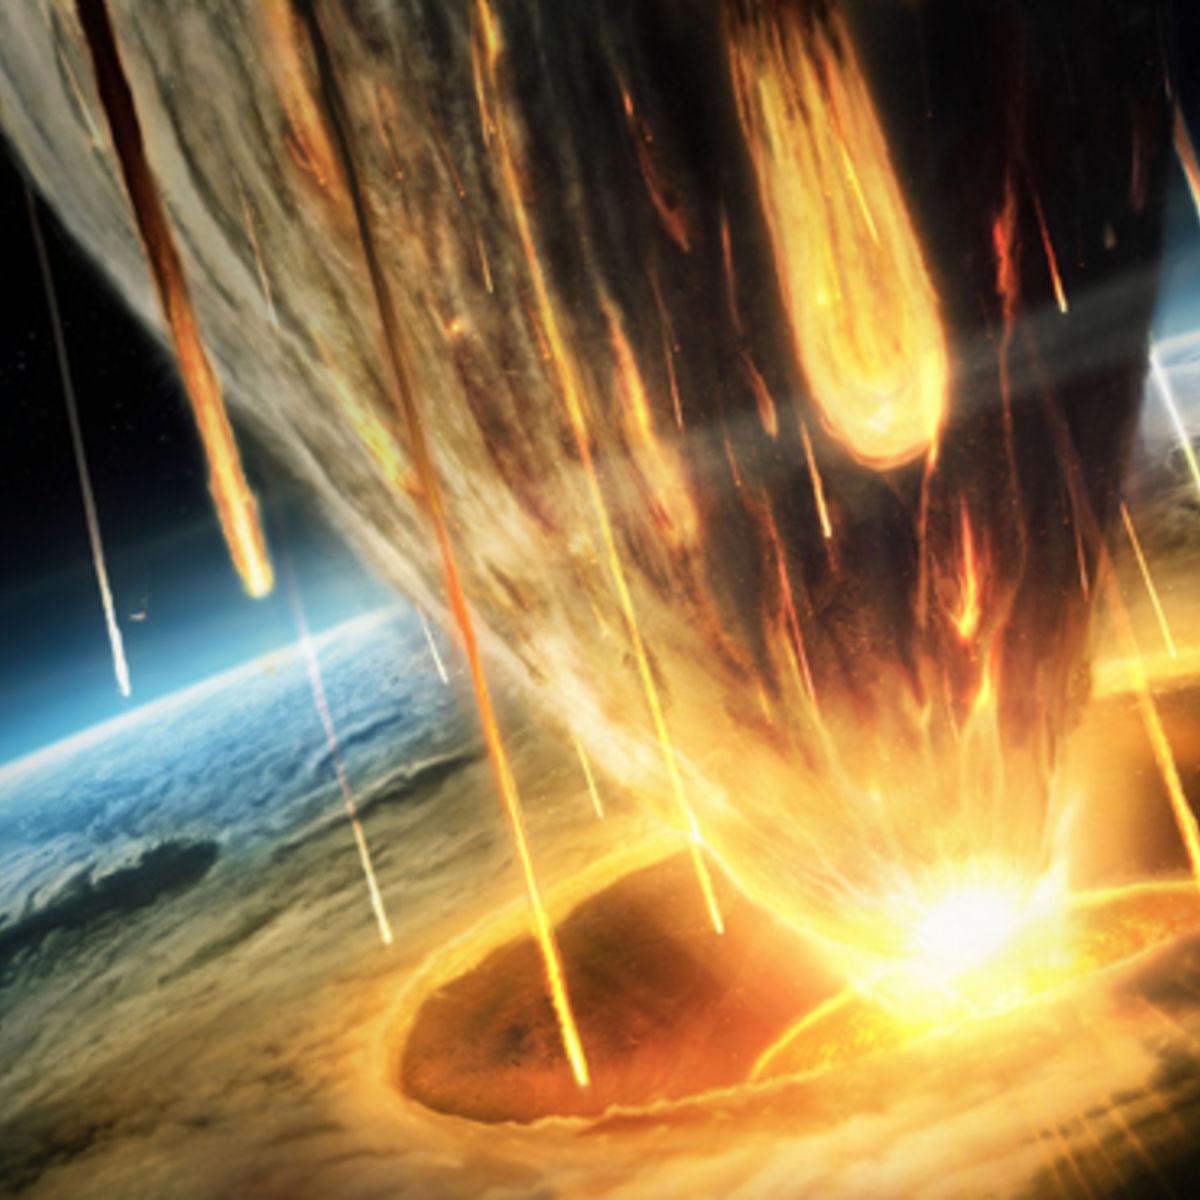 asteroid_impact_alamy.jpg